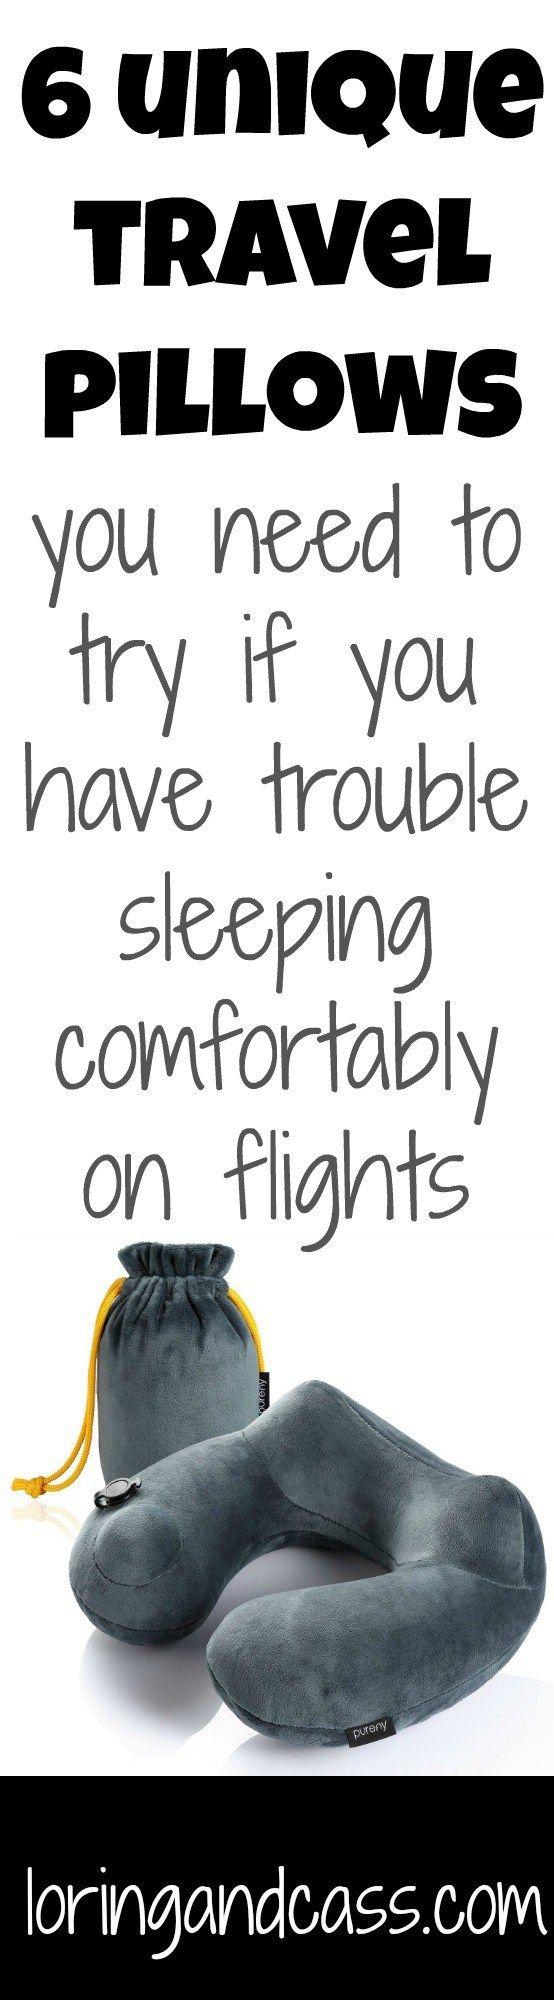 25 Best Ideas About Travel Pillows On Pinterest Kids Travel Pillows Pillow Tutorial And Neck